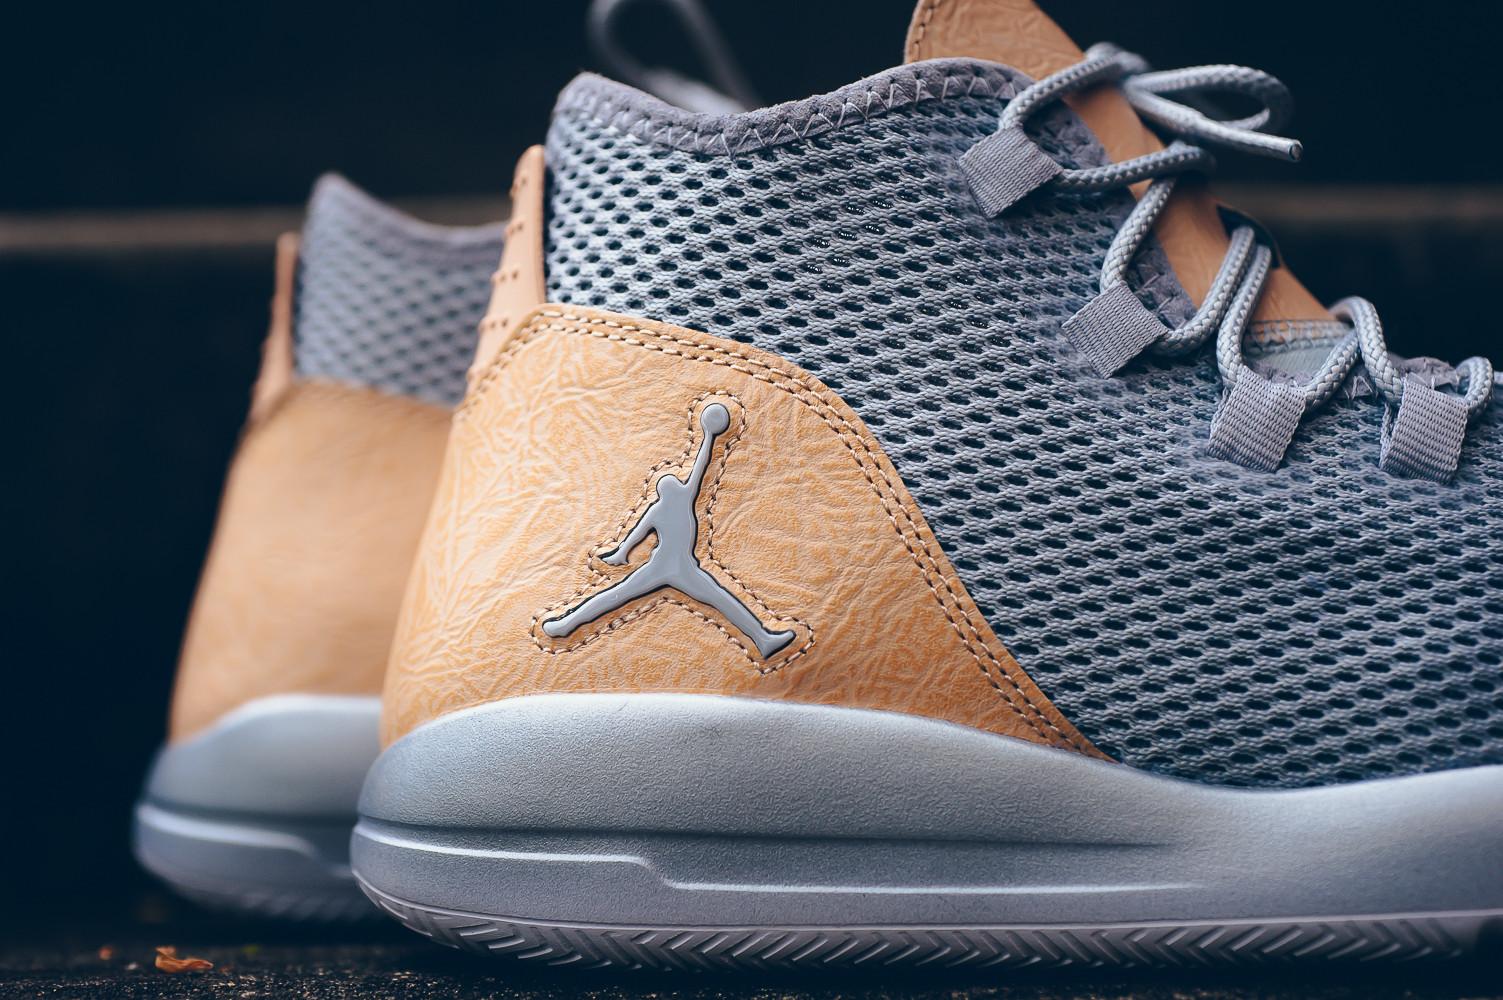 brand new a0106 97a29 Jordan Reveal Archives - Air Jordans, Release Dates   More    JordansDaily.com